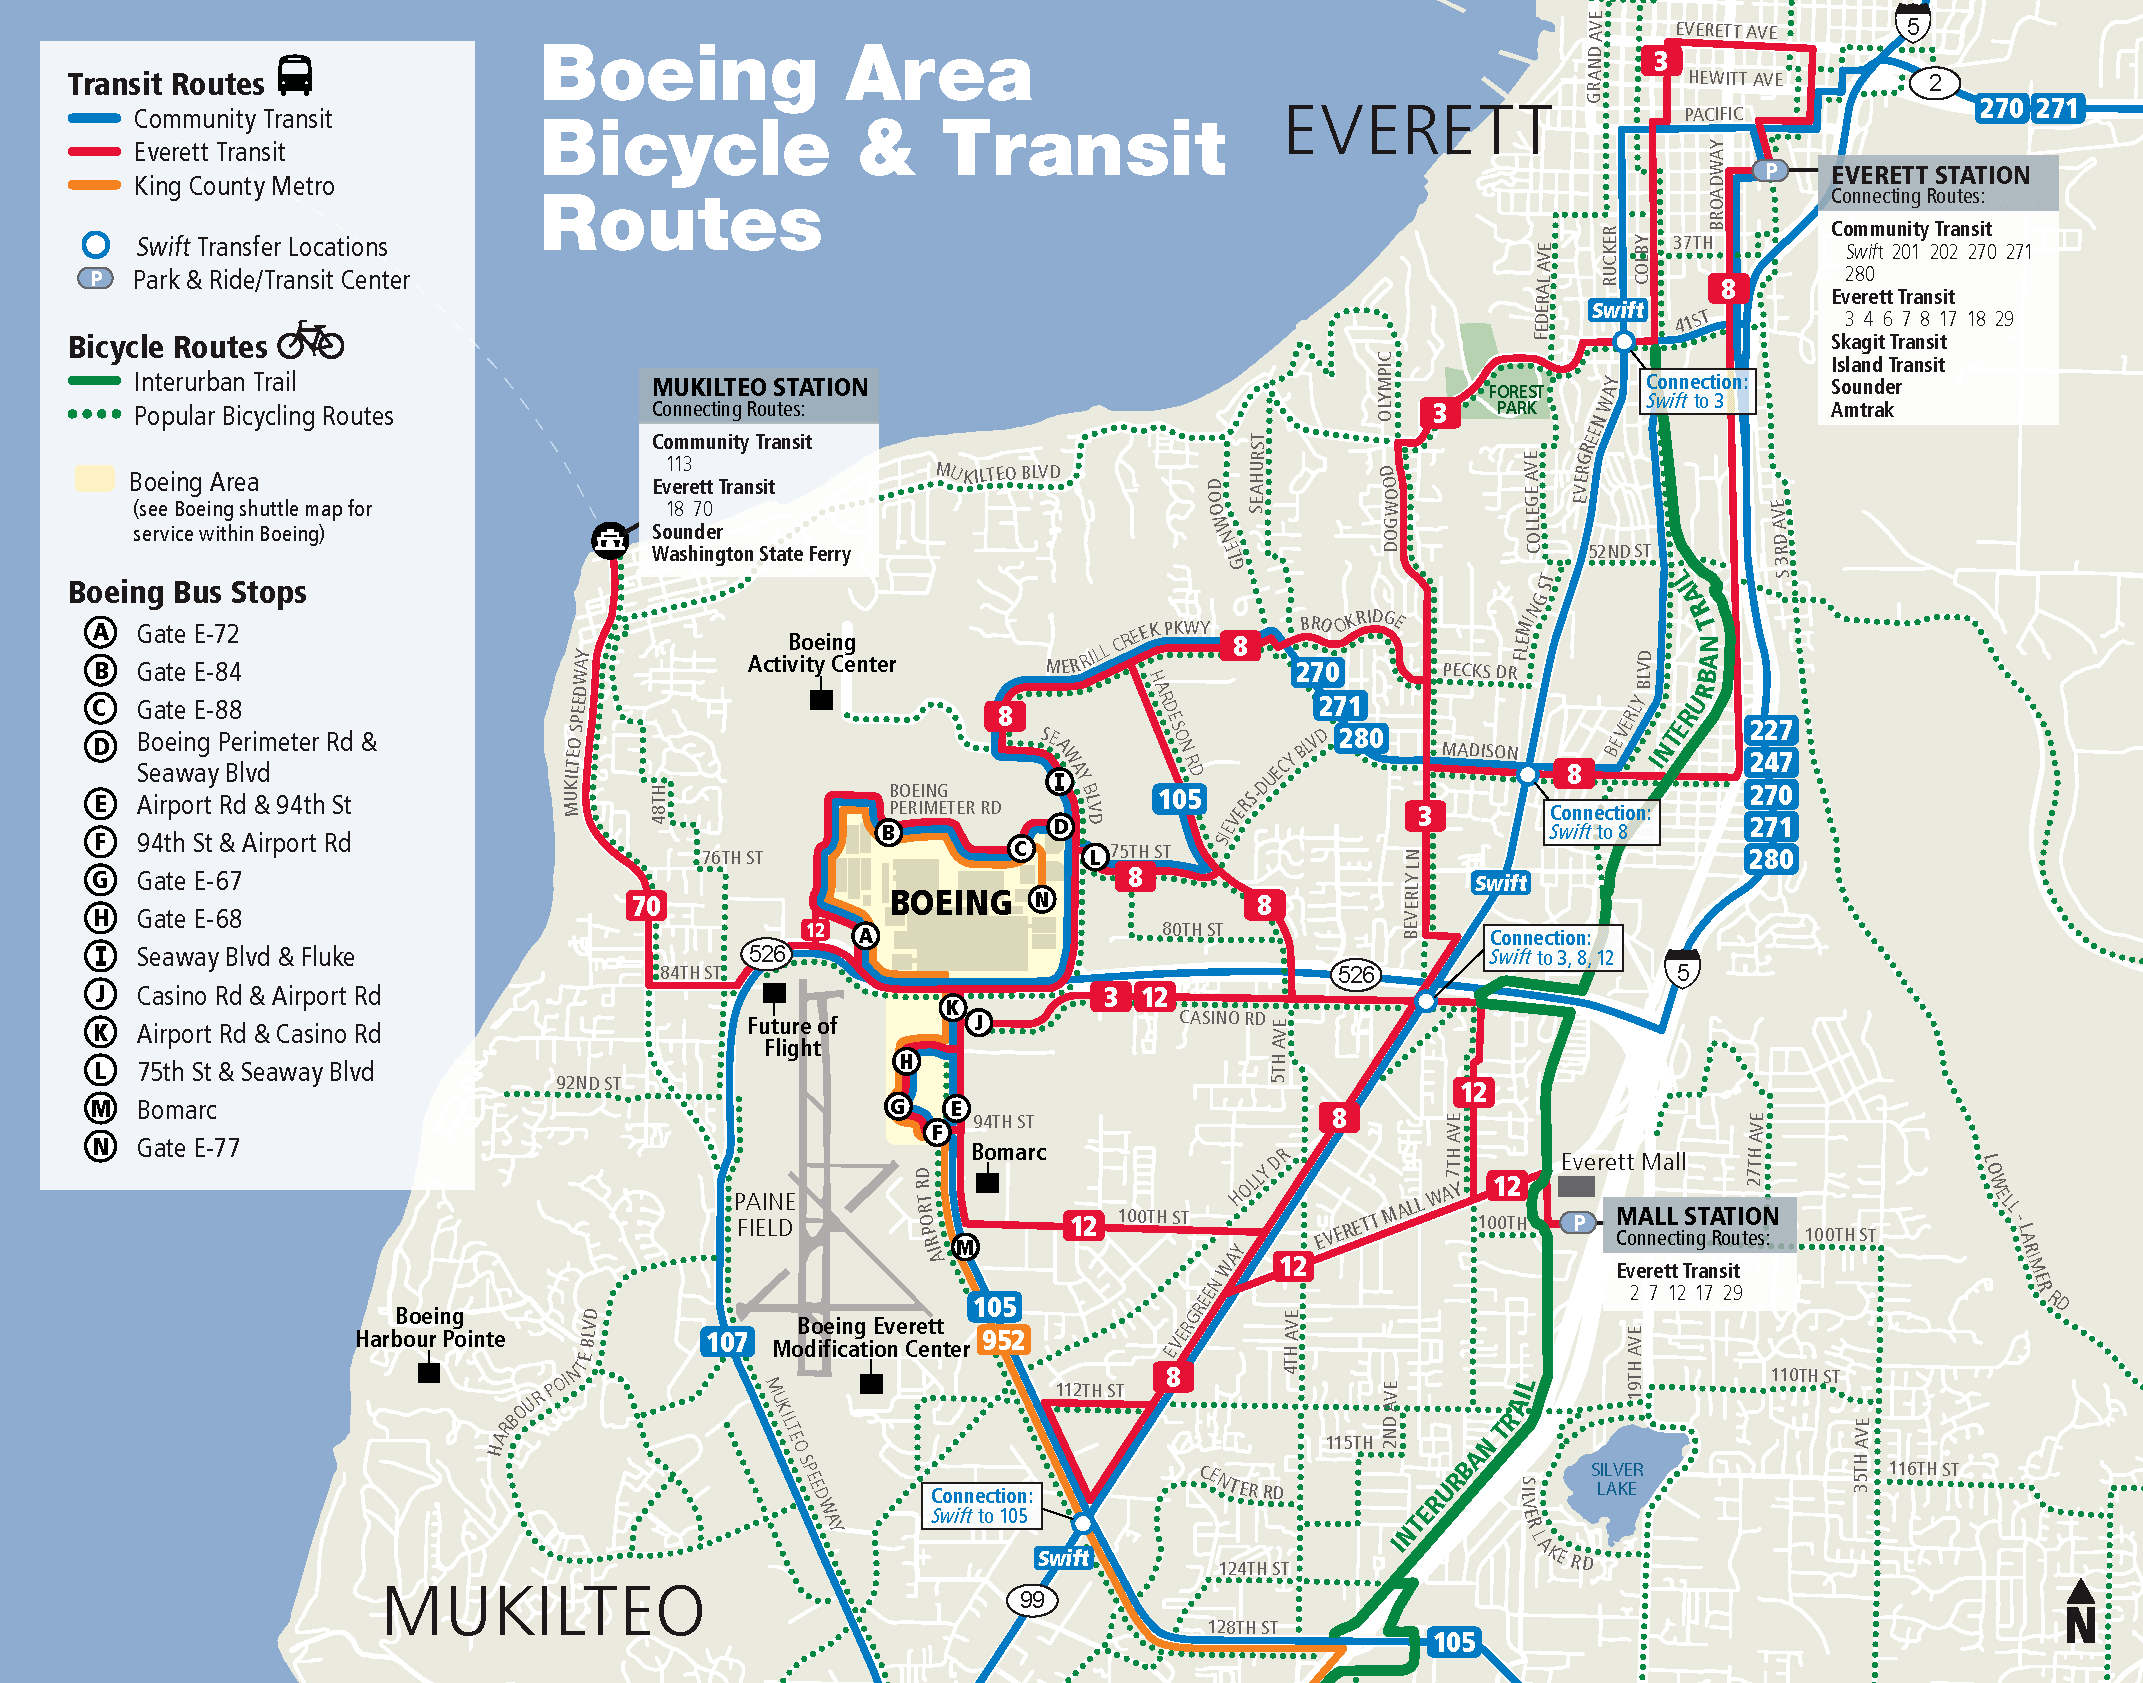 Going To Boeing Everett Everett Transit Wa Official Website